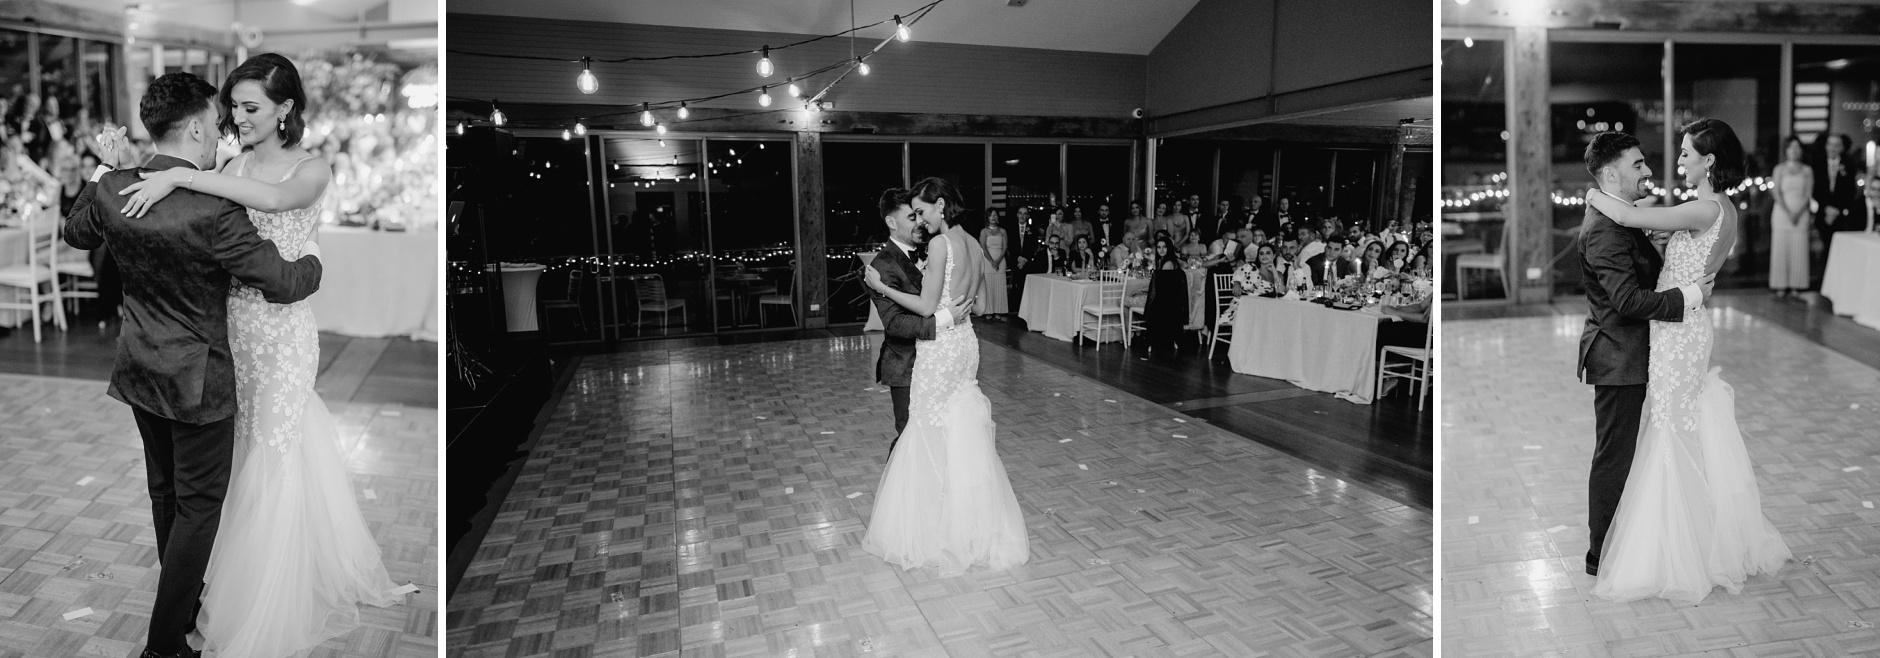 Sydney-Wedding-Photographer_0173.jpg